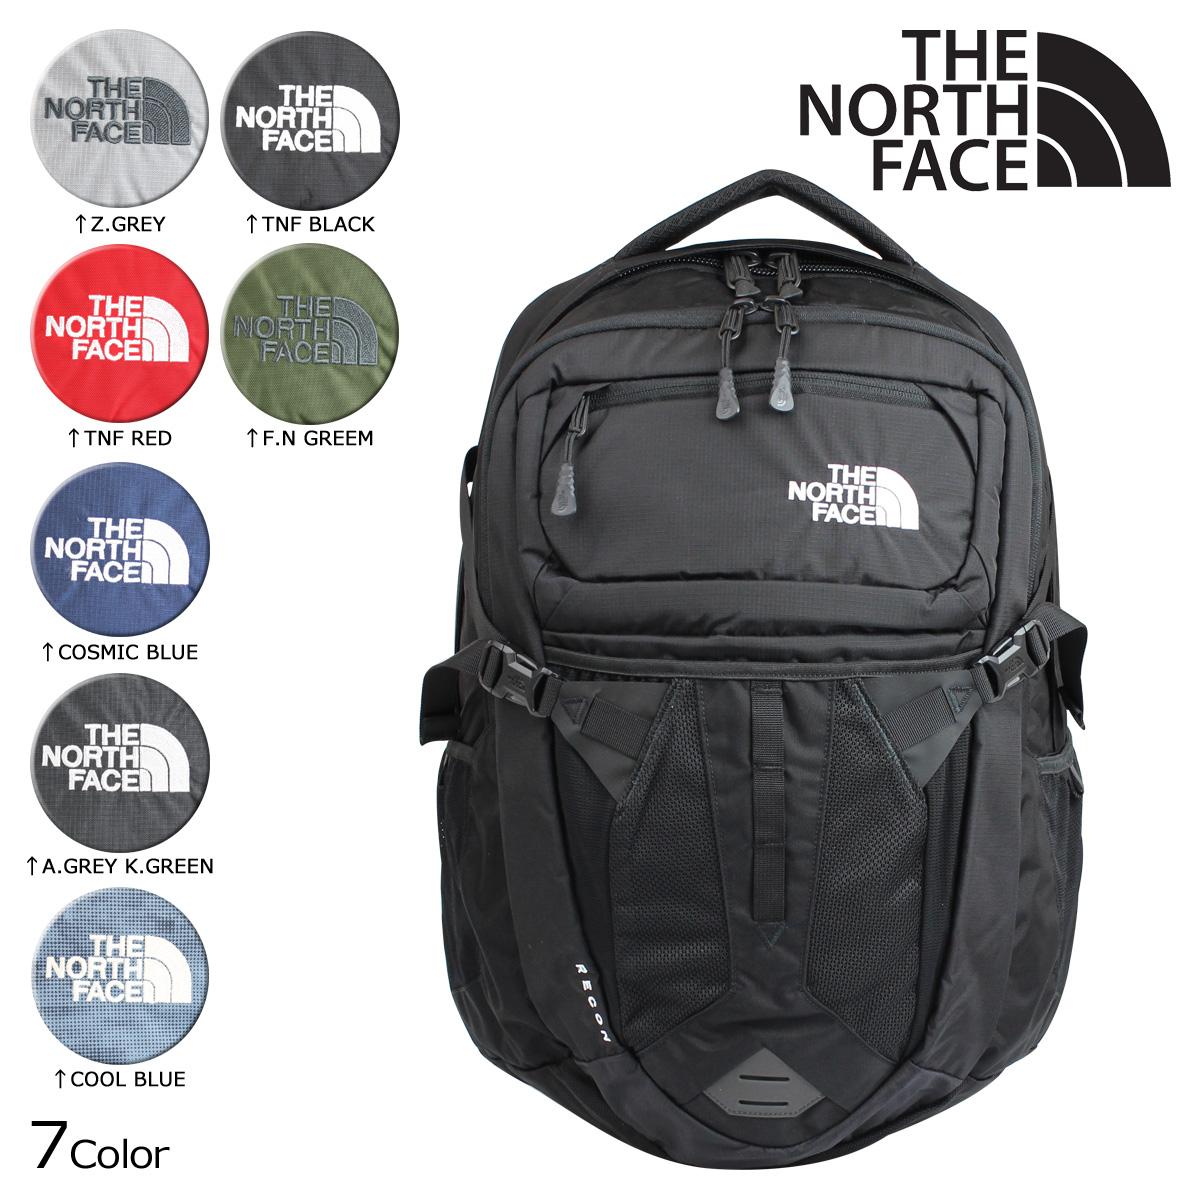 recon the north face